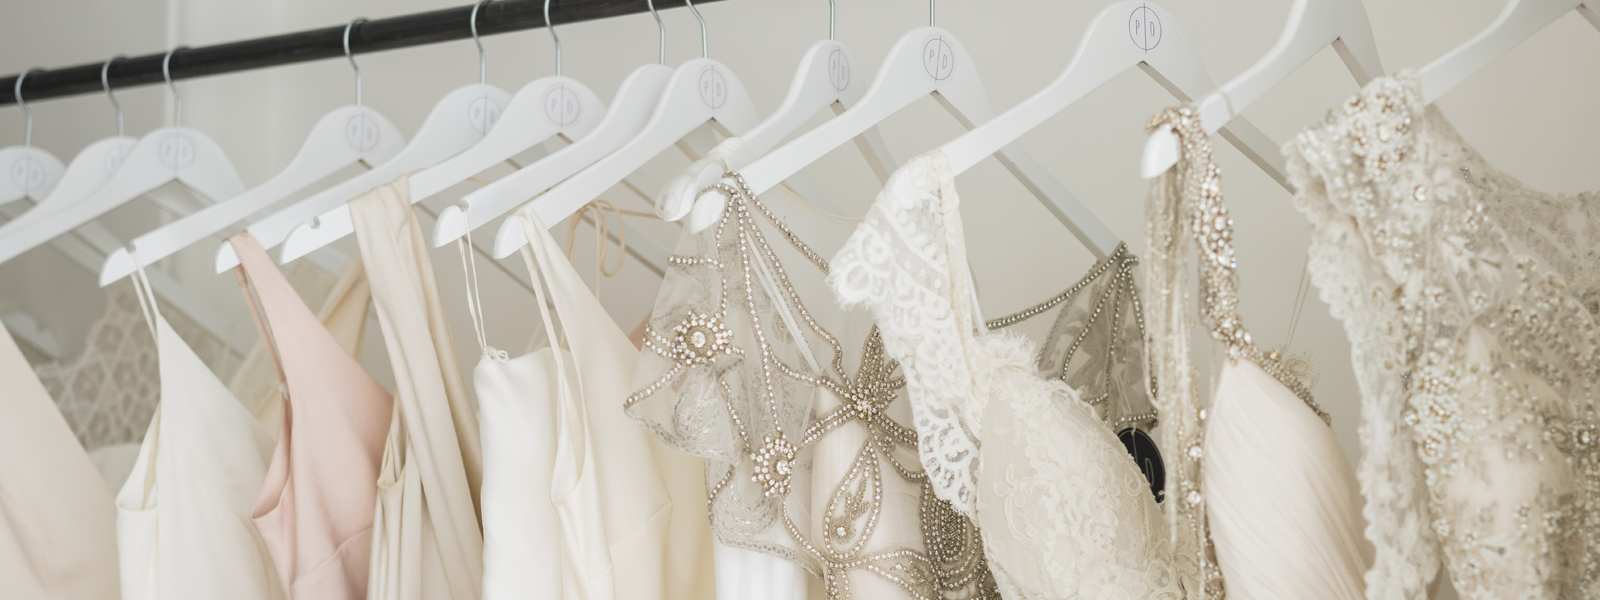 About Perfect Day Bridal | Vintage Wedding Dresses Bristol & Bath